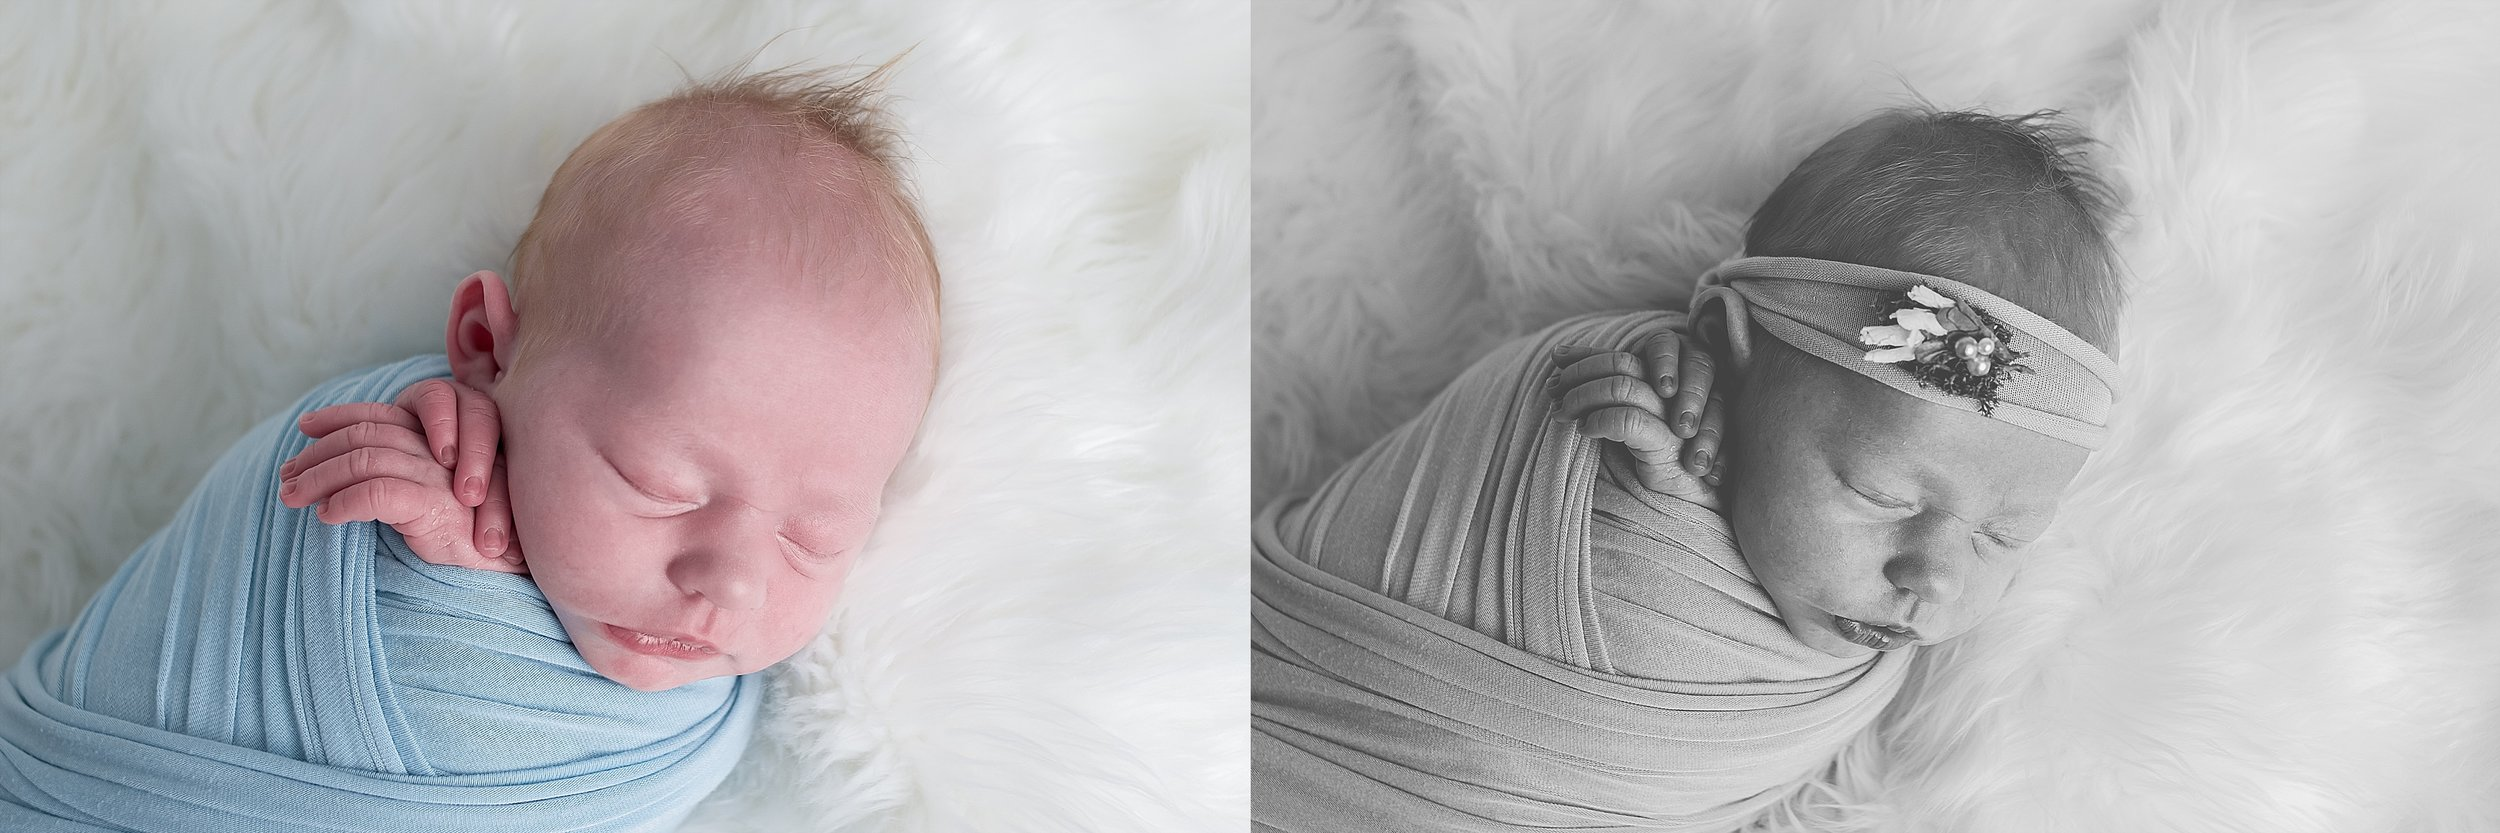 BrittneyHogue-PekinILNewbornPhotographer-PeoriaILNewbornPhotographer (1).jpg